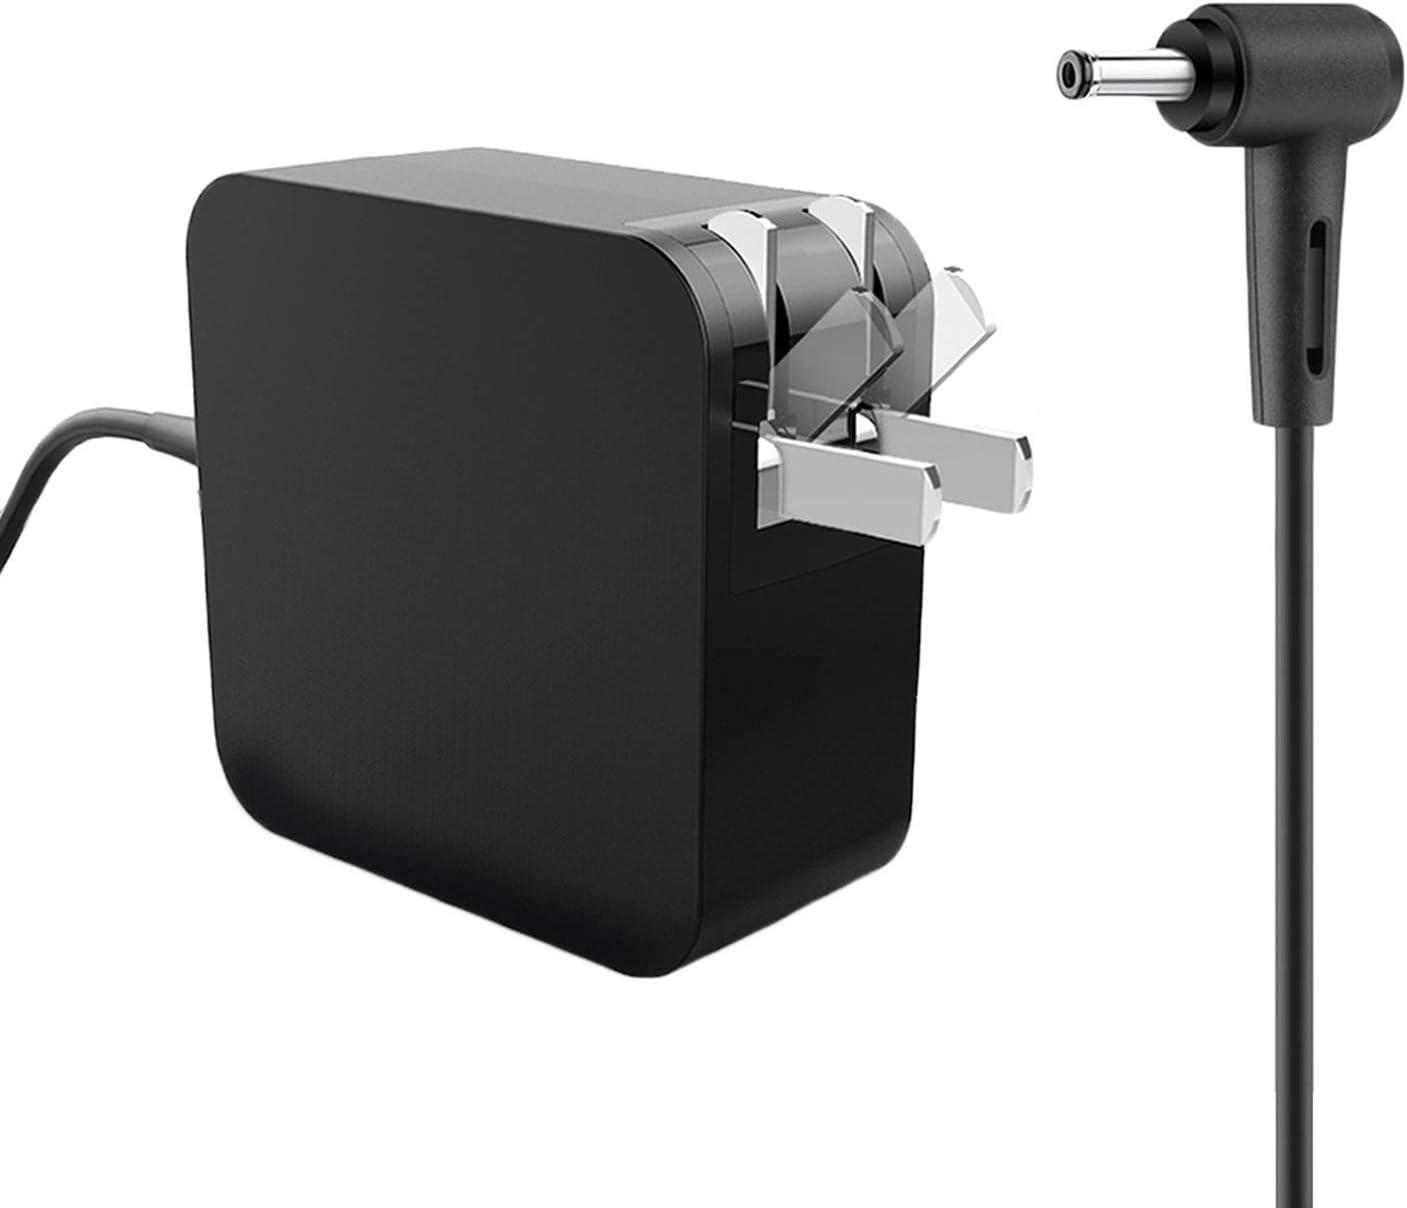 Portable Laptop Power AC Adapter 19V 2.37A 45W Charger for Asus Q503 Q503U Q503UA Q504 Q504U Q504UA Q553 Q553U Q553UB X540 X540S X540SA X540L X540LA X540N X540NA Asus Power Supply